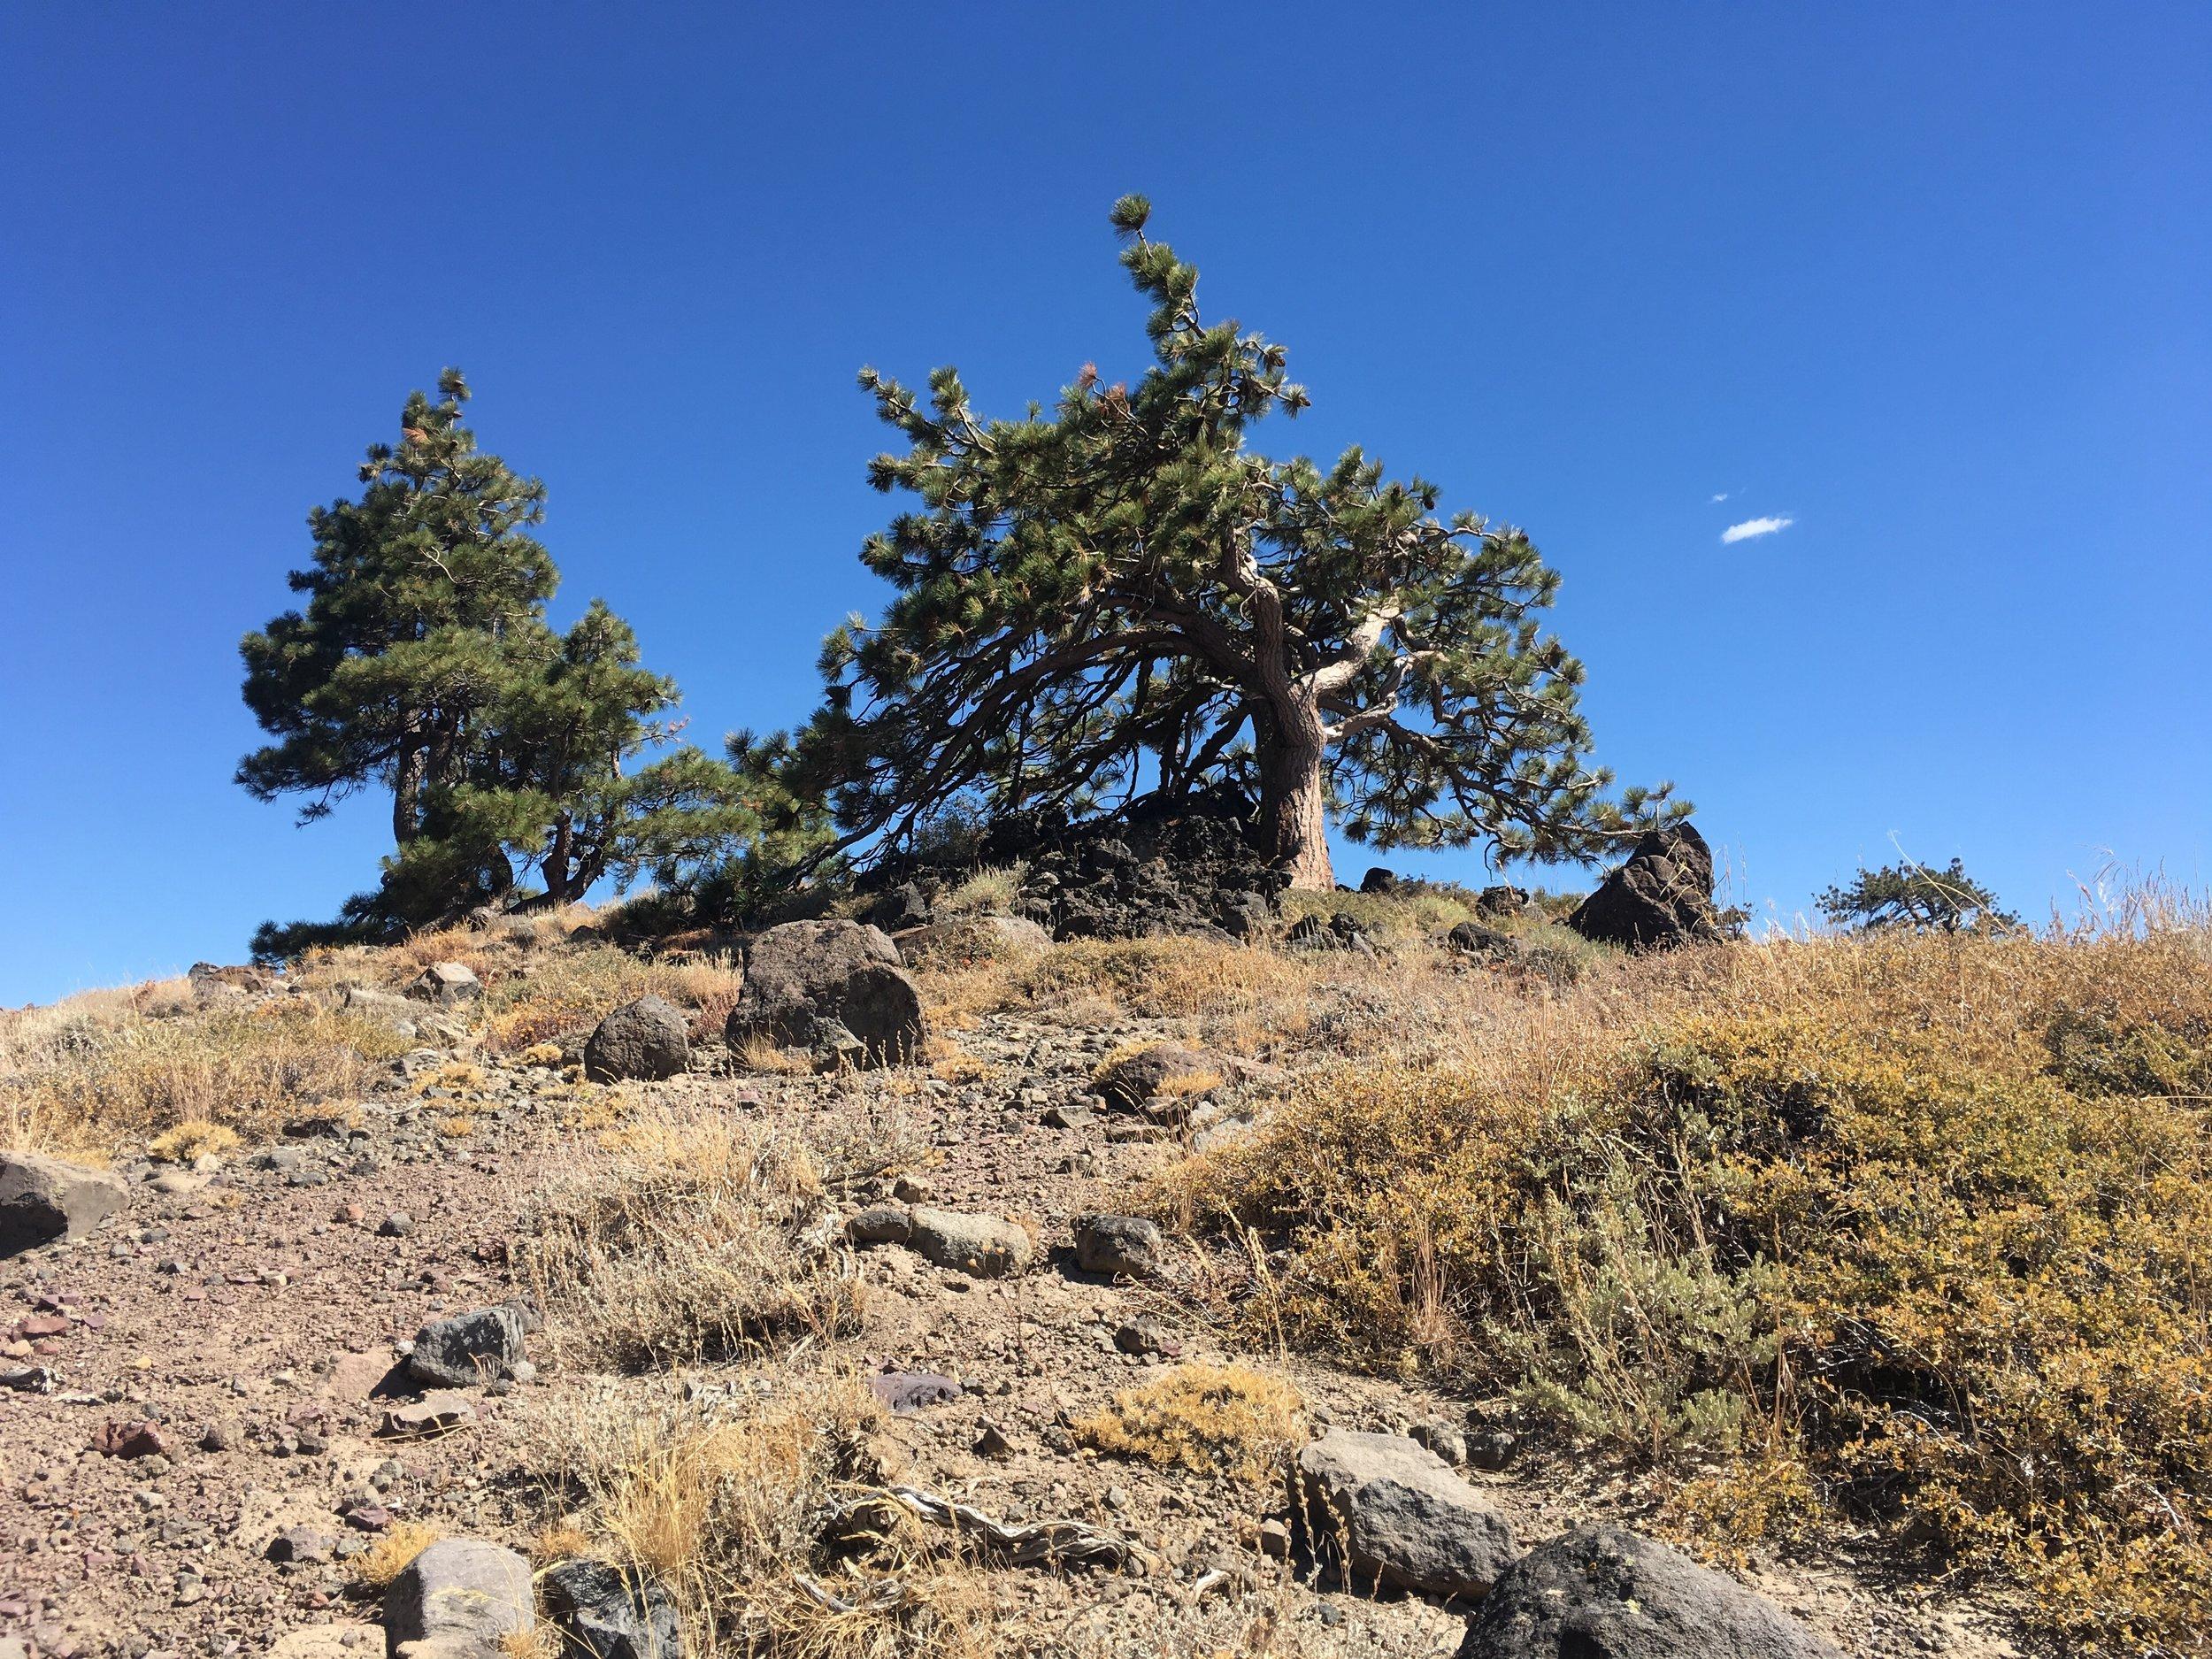 Jeffrey pines take on extraordinary shapes on the windswept ridges.